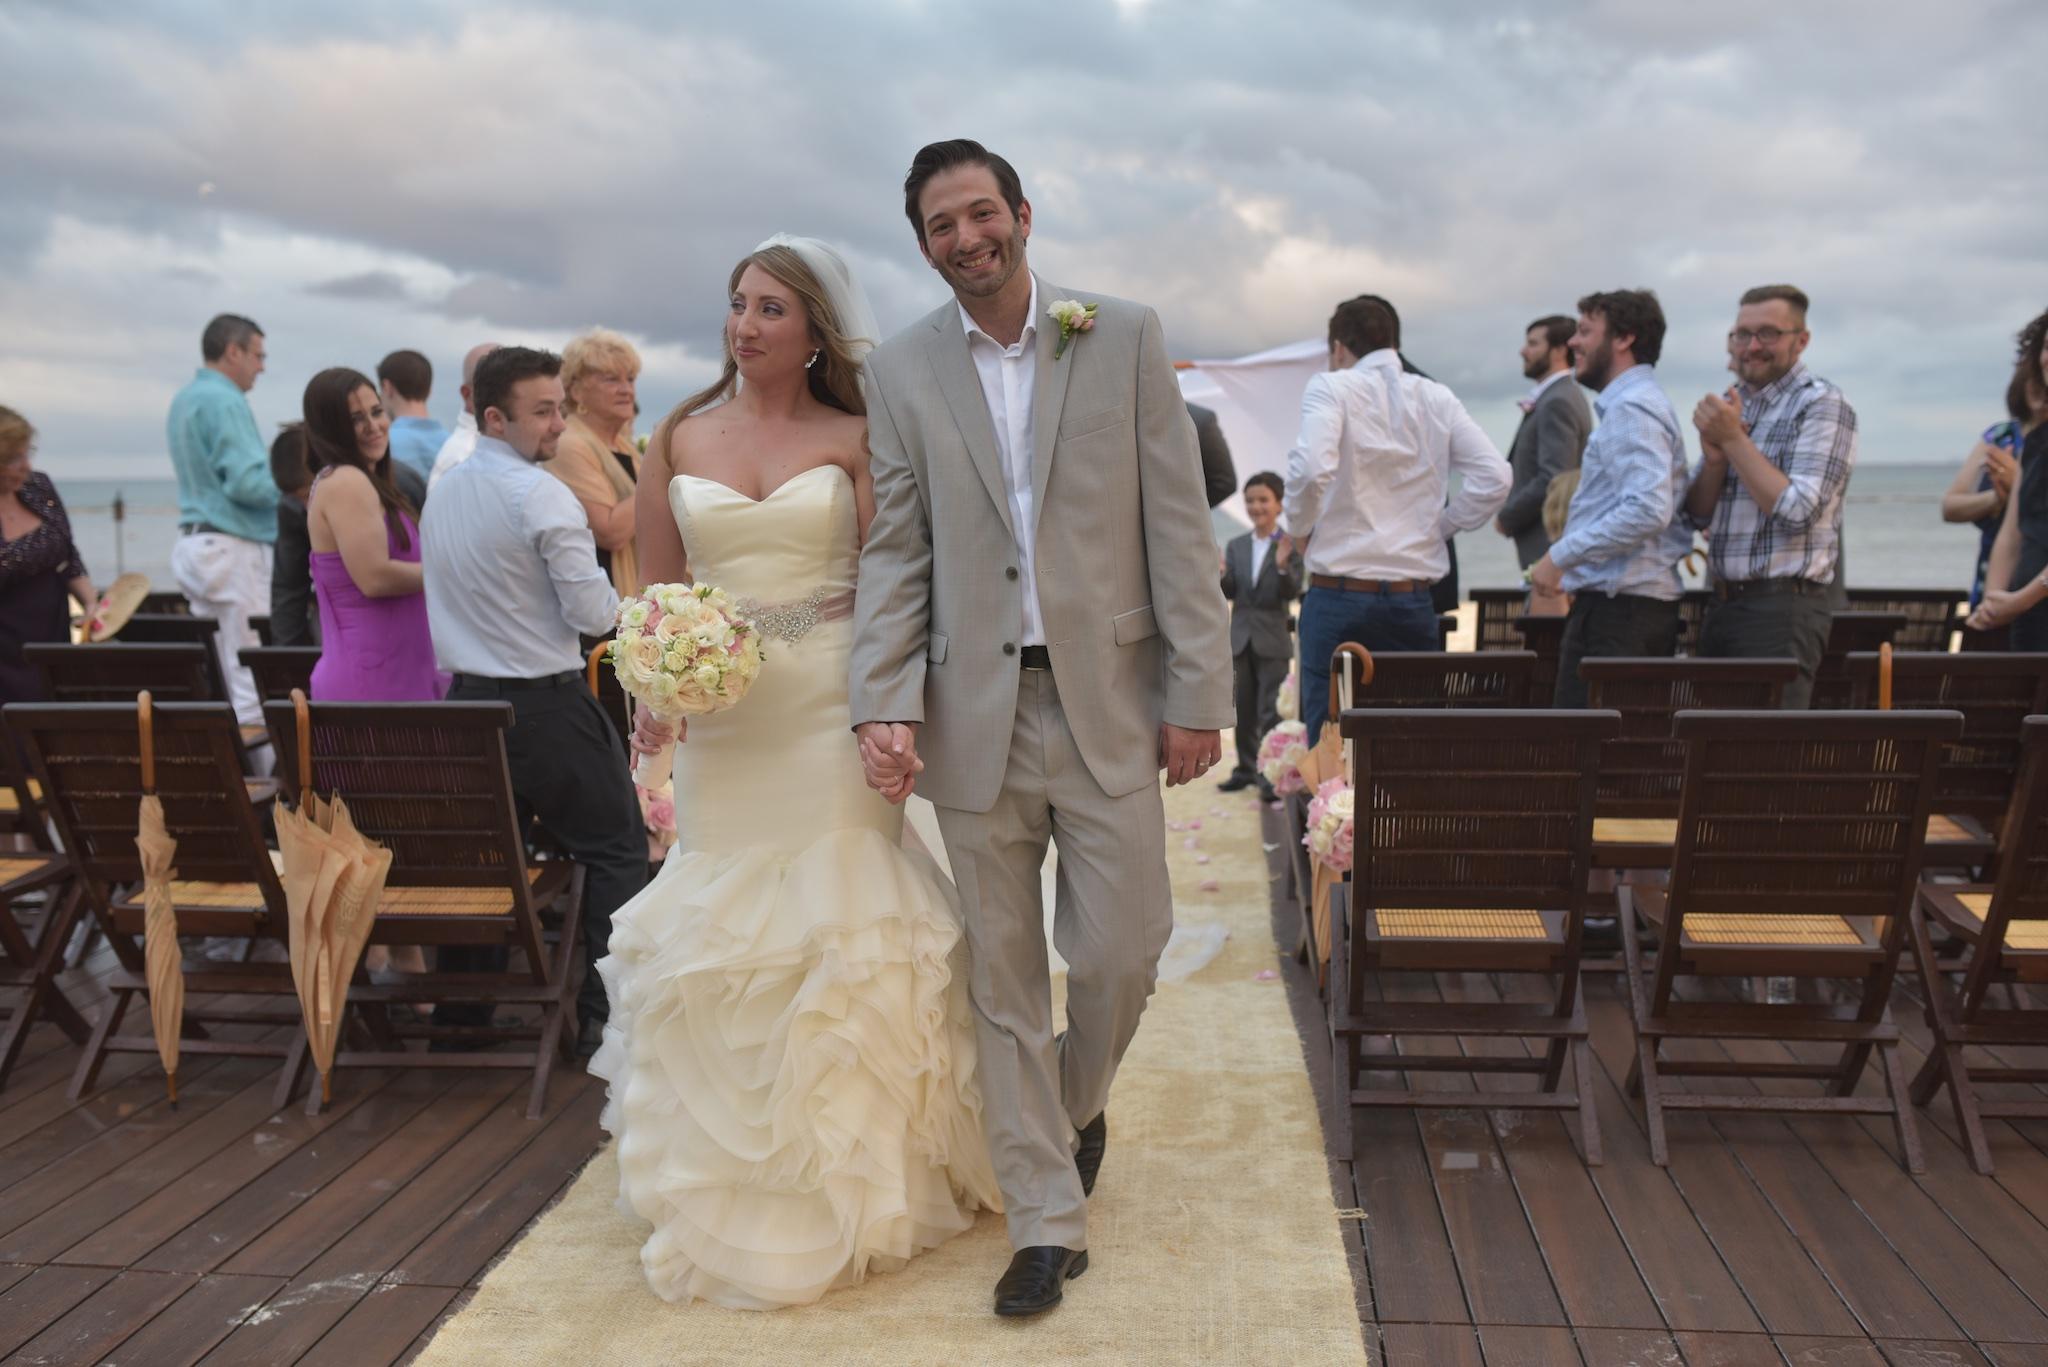 bride and groom at destination wedding ceremony